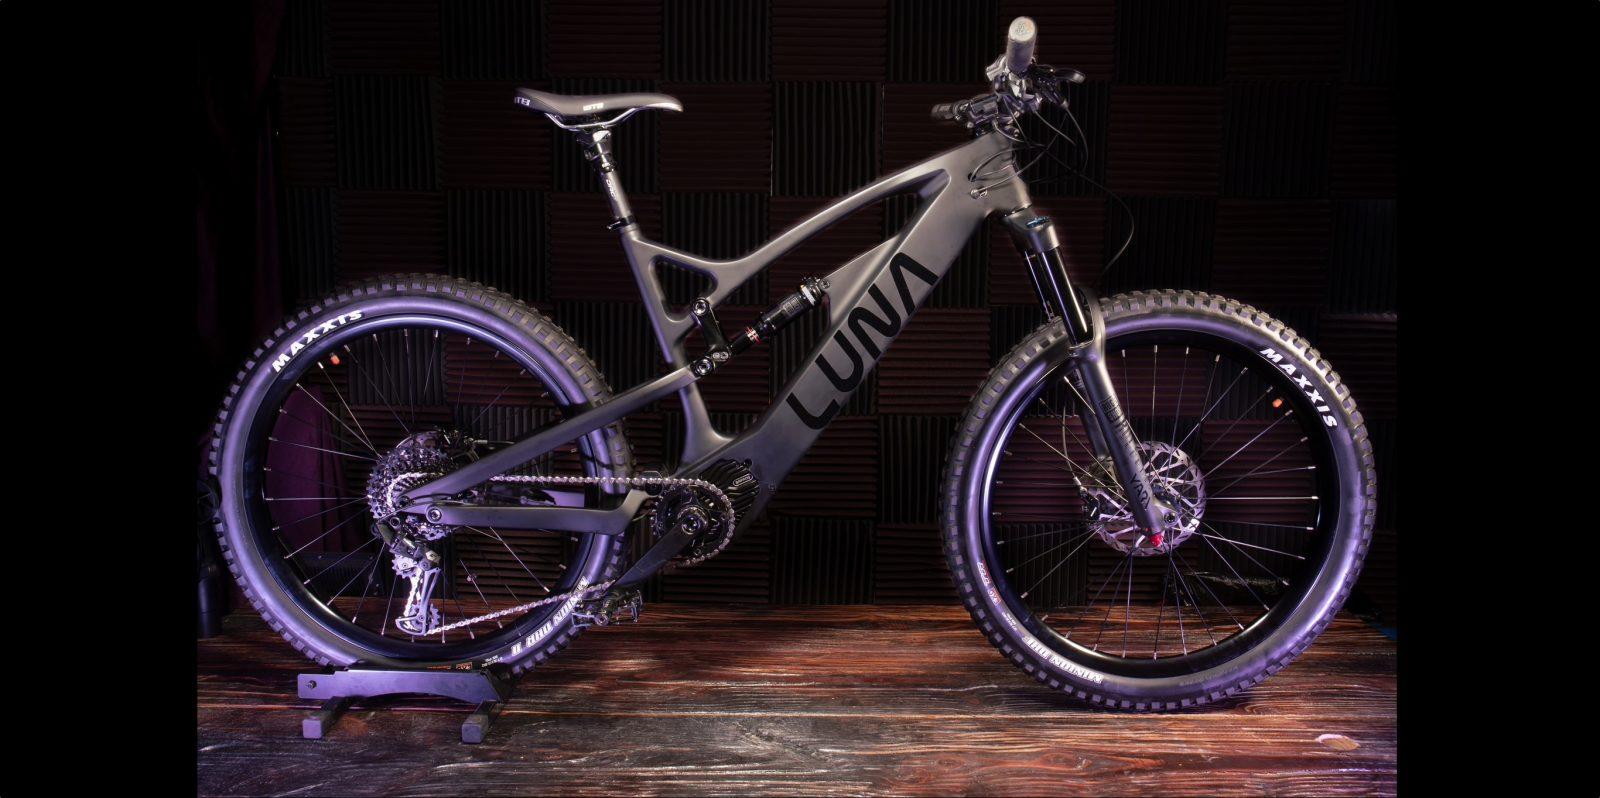 958eab8b518 Luna's new 'Ludicruous Mode' 2,000 W enduro e-bike has shockingly low price